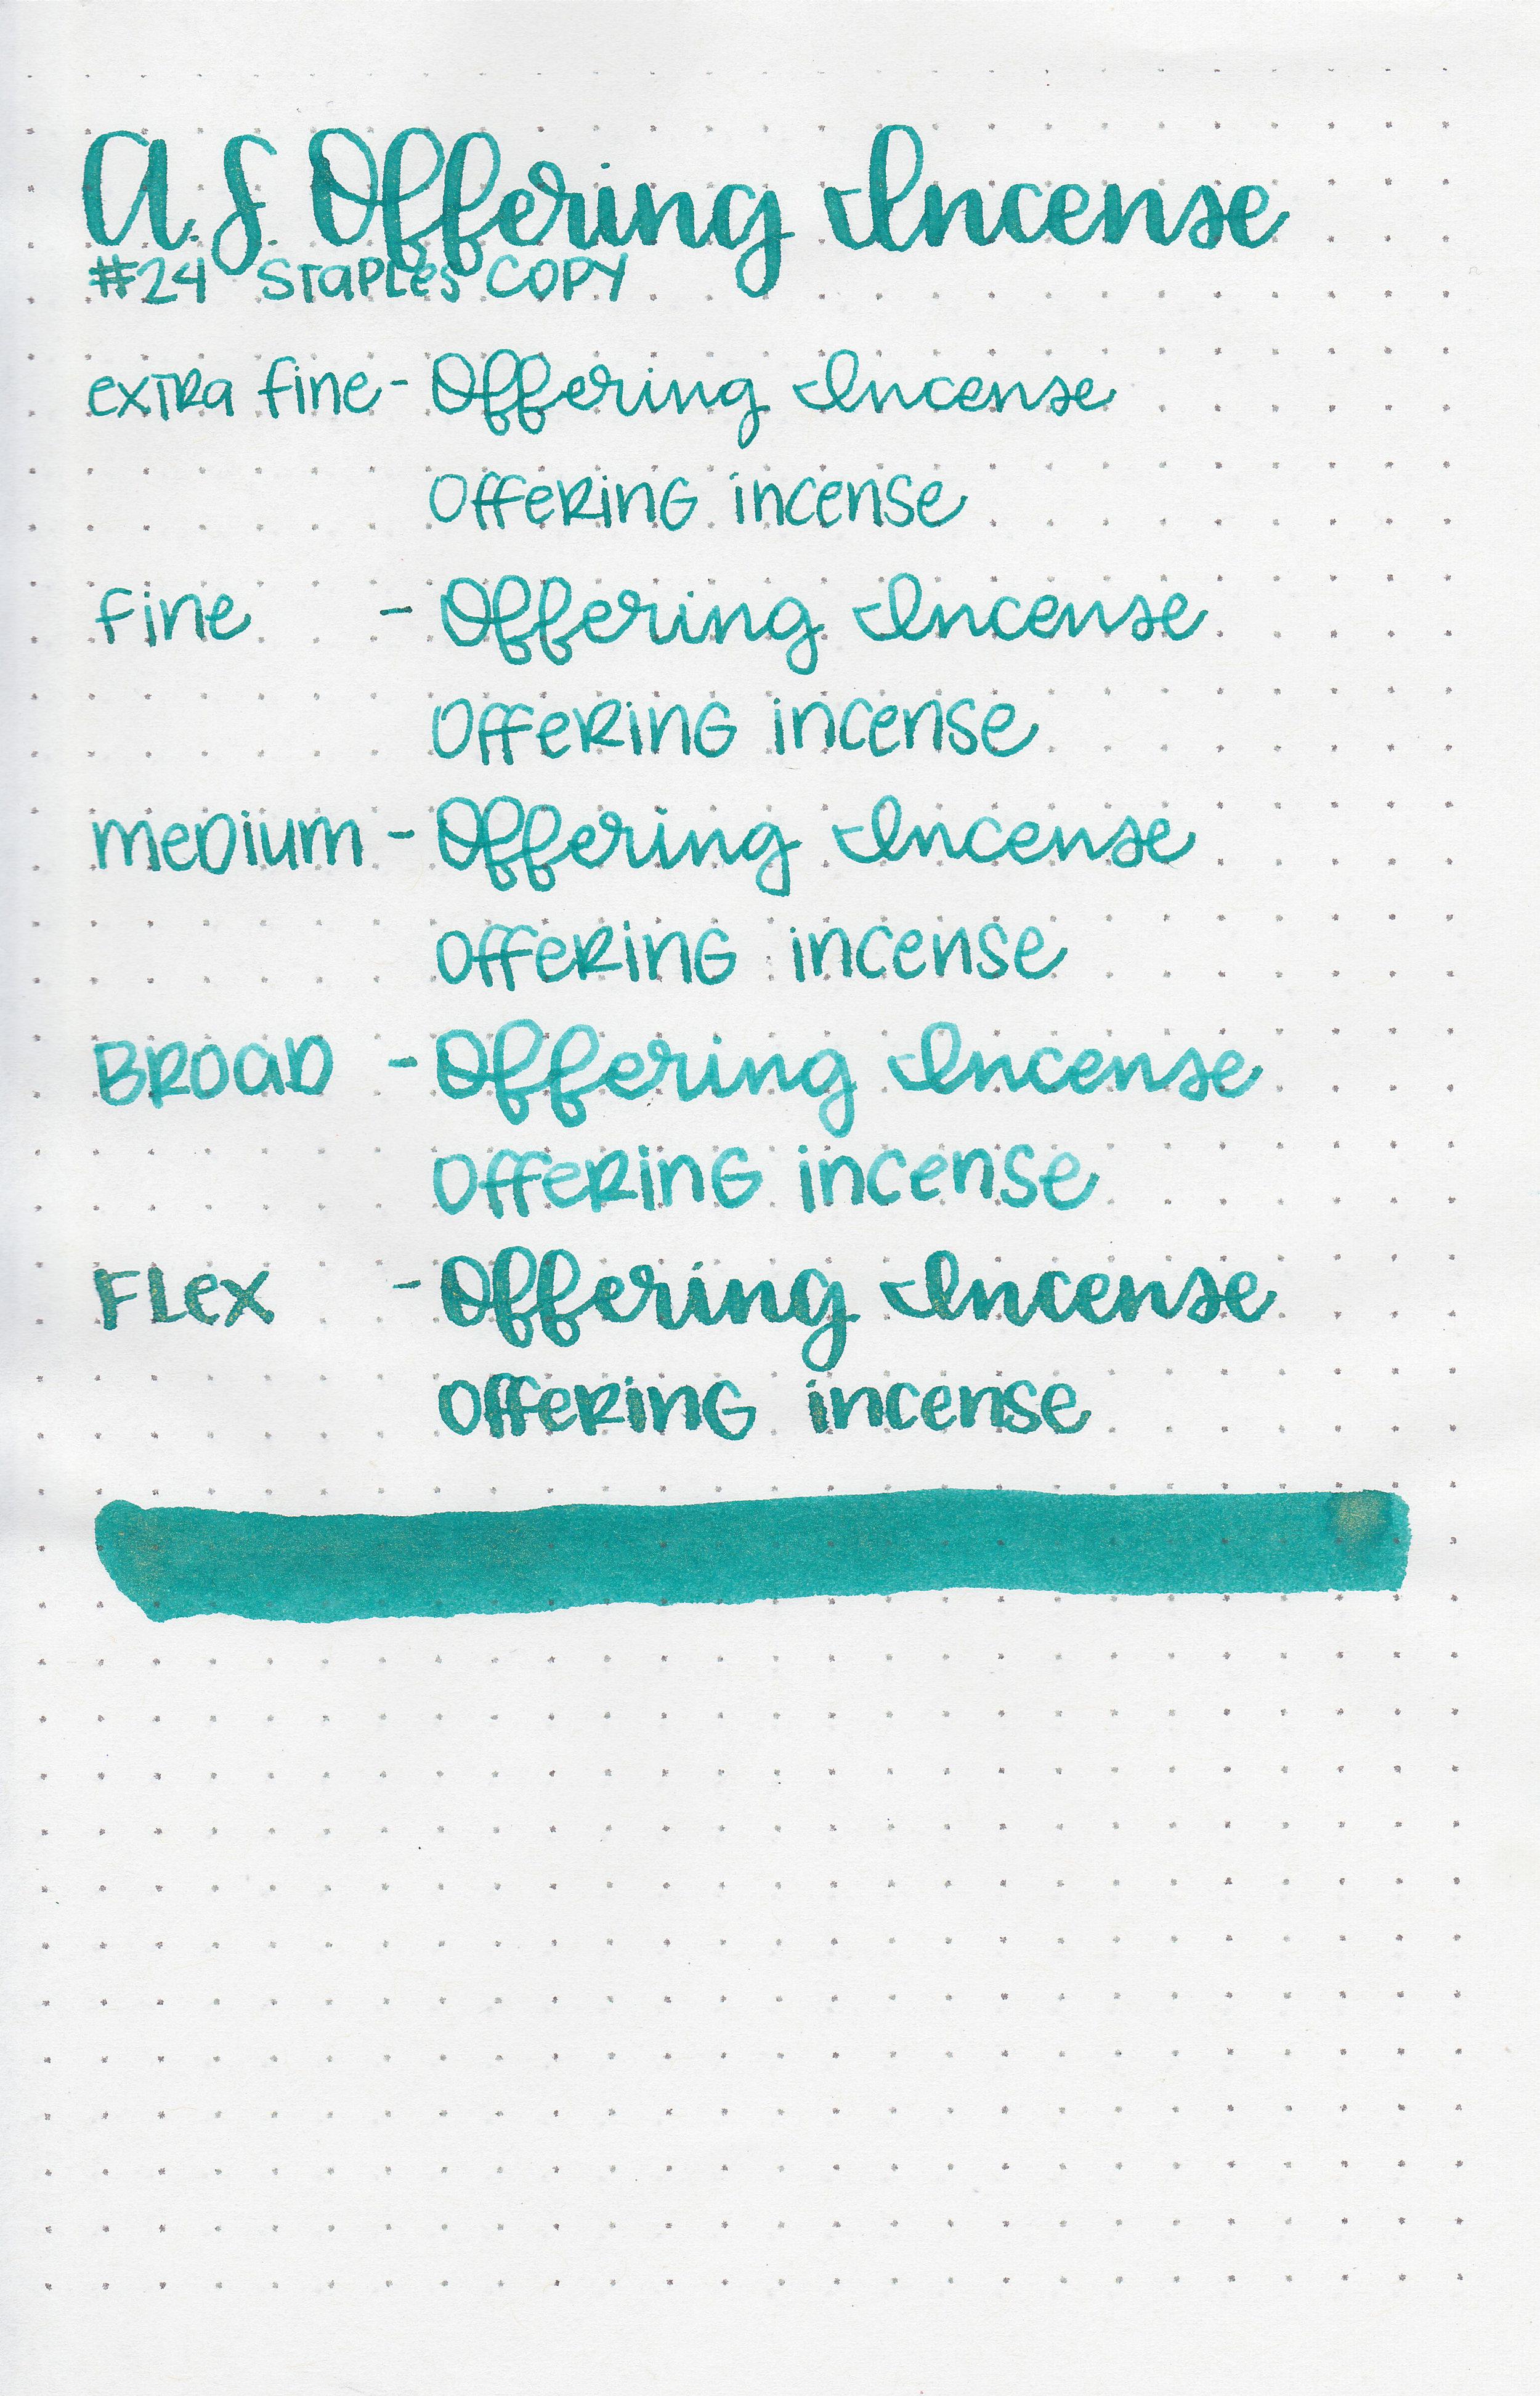 as-offering-incense-12.jpg